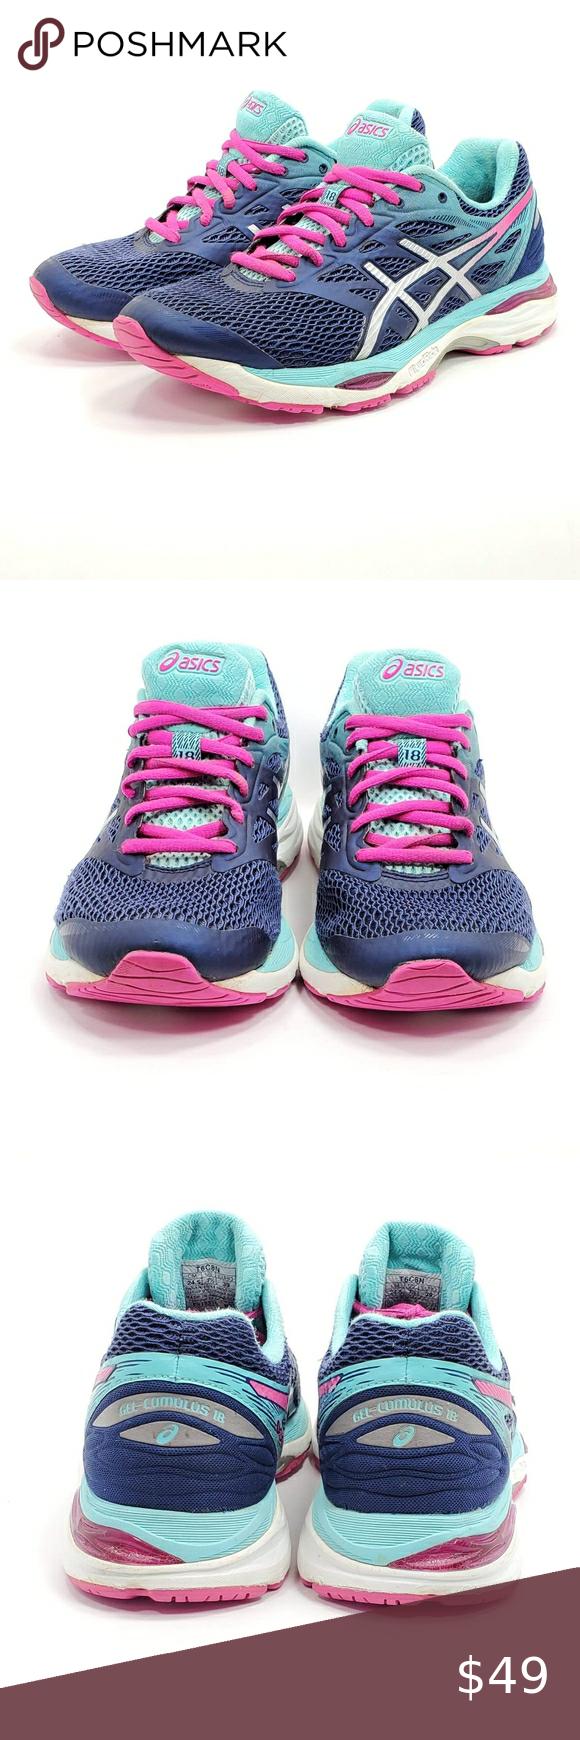 Asics Gel Cumulus 18 Running Training Shoes Blue Womens Running Shoes Blue Shoes Training Shoes